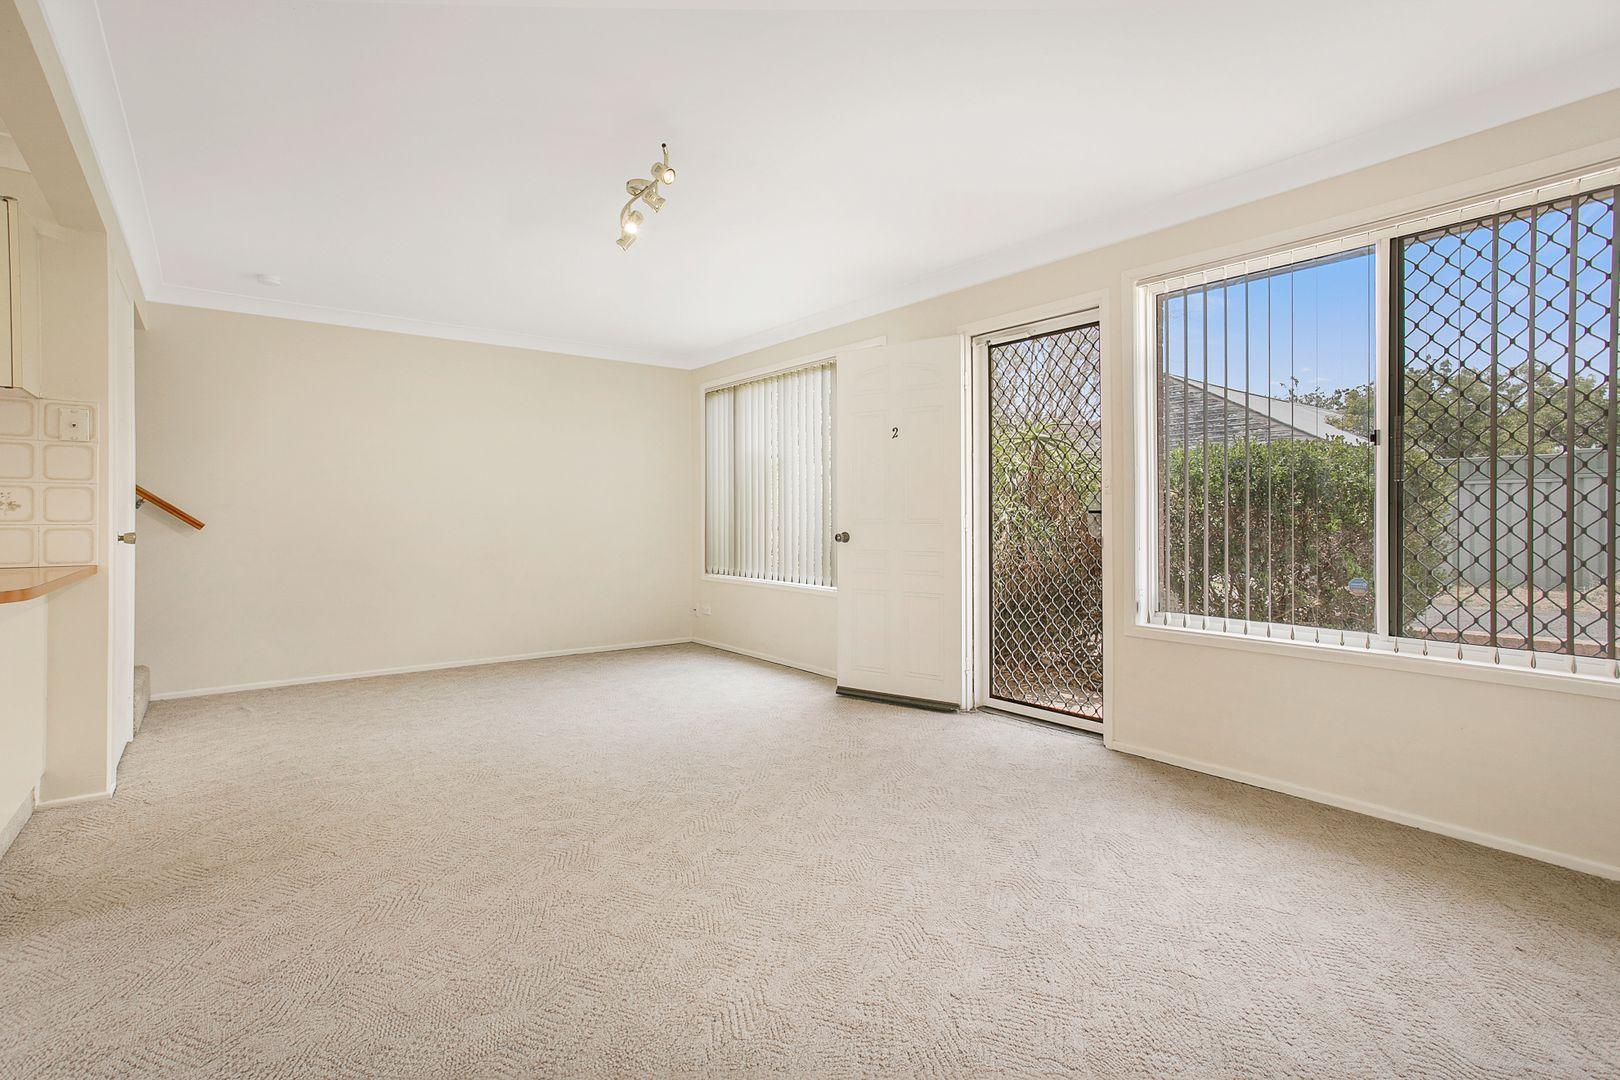 2/22 King Street, Tamworth NSW 2340, Image 1